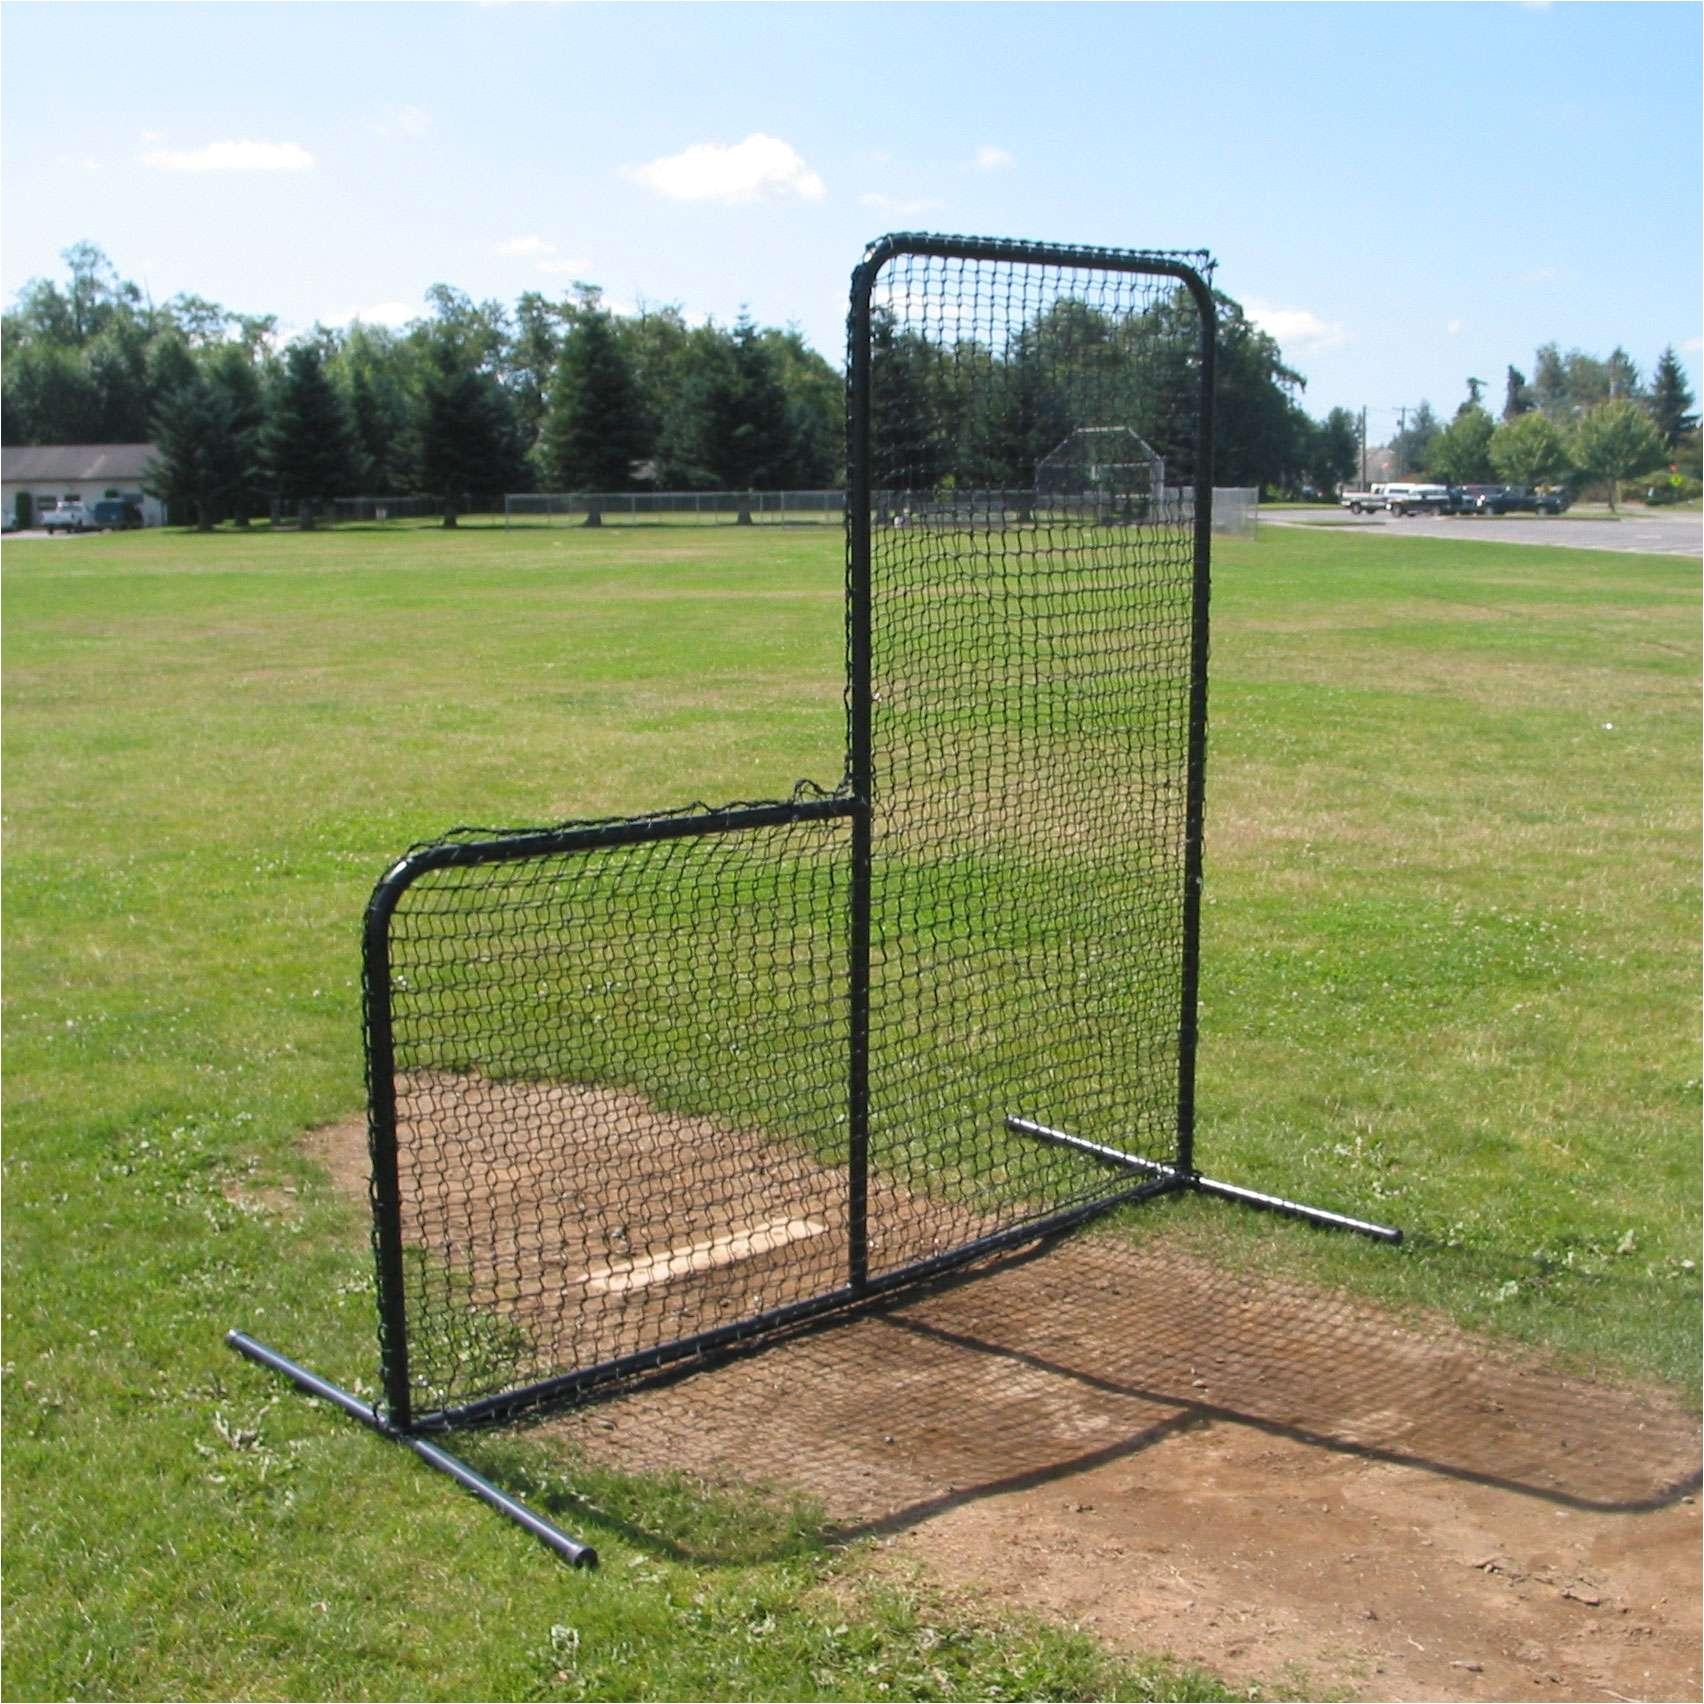 backyard batting cage turf fresh mercial batting cage package deal batting cages of backyard batting cage